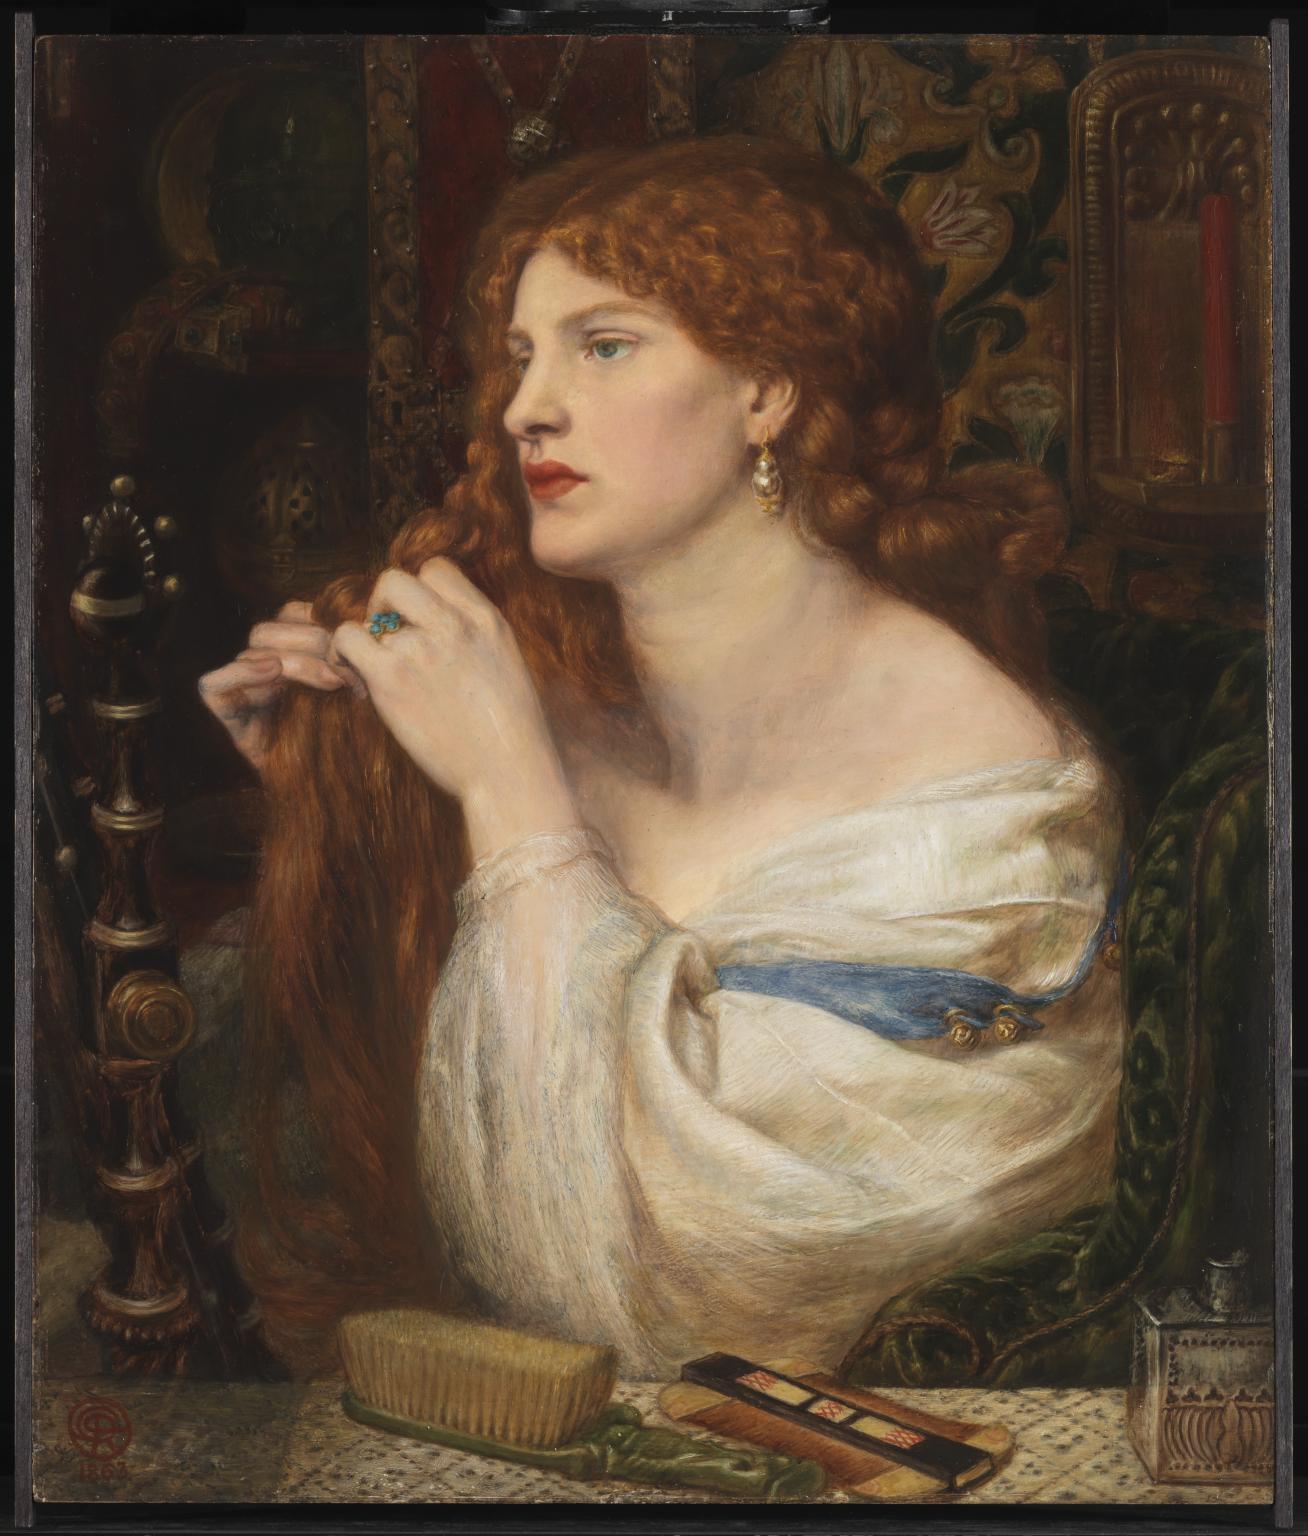 Dante Gabriel Rossetti, Aurelia (l'amante di Fazio) (1863-1873; olio su tavola, 43,2 x 36,8 cm; Londra, Tate Britain)